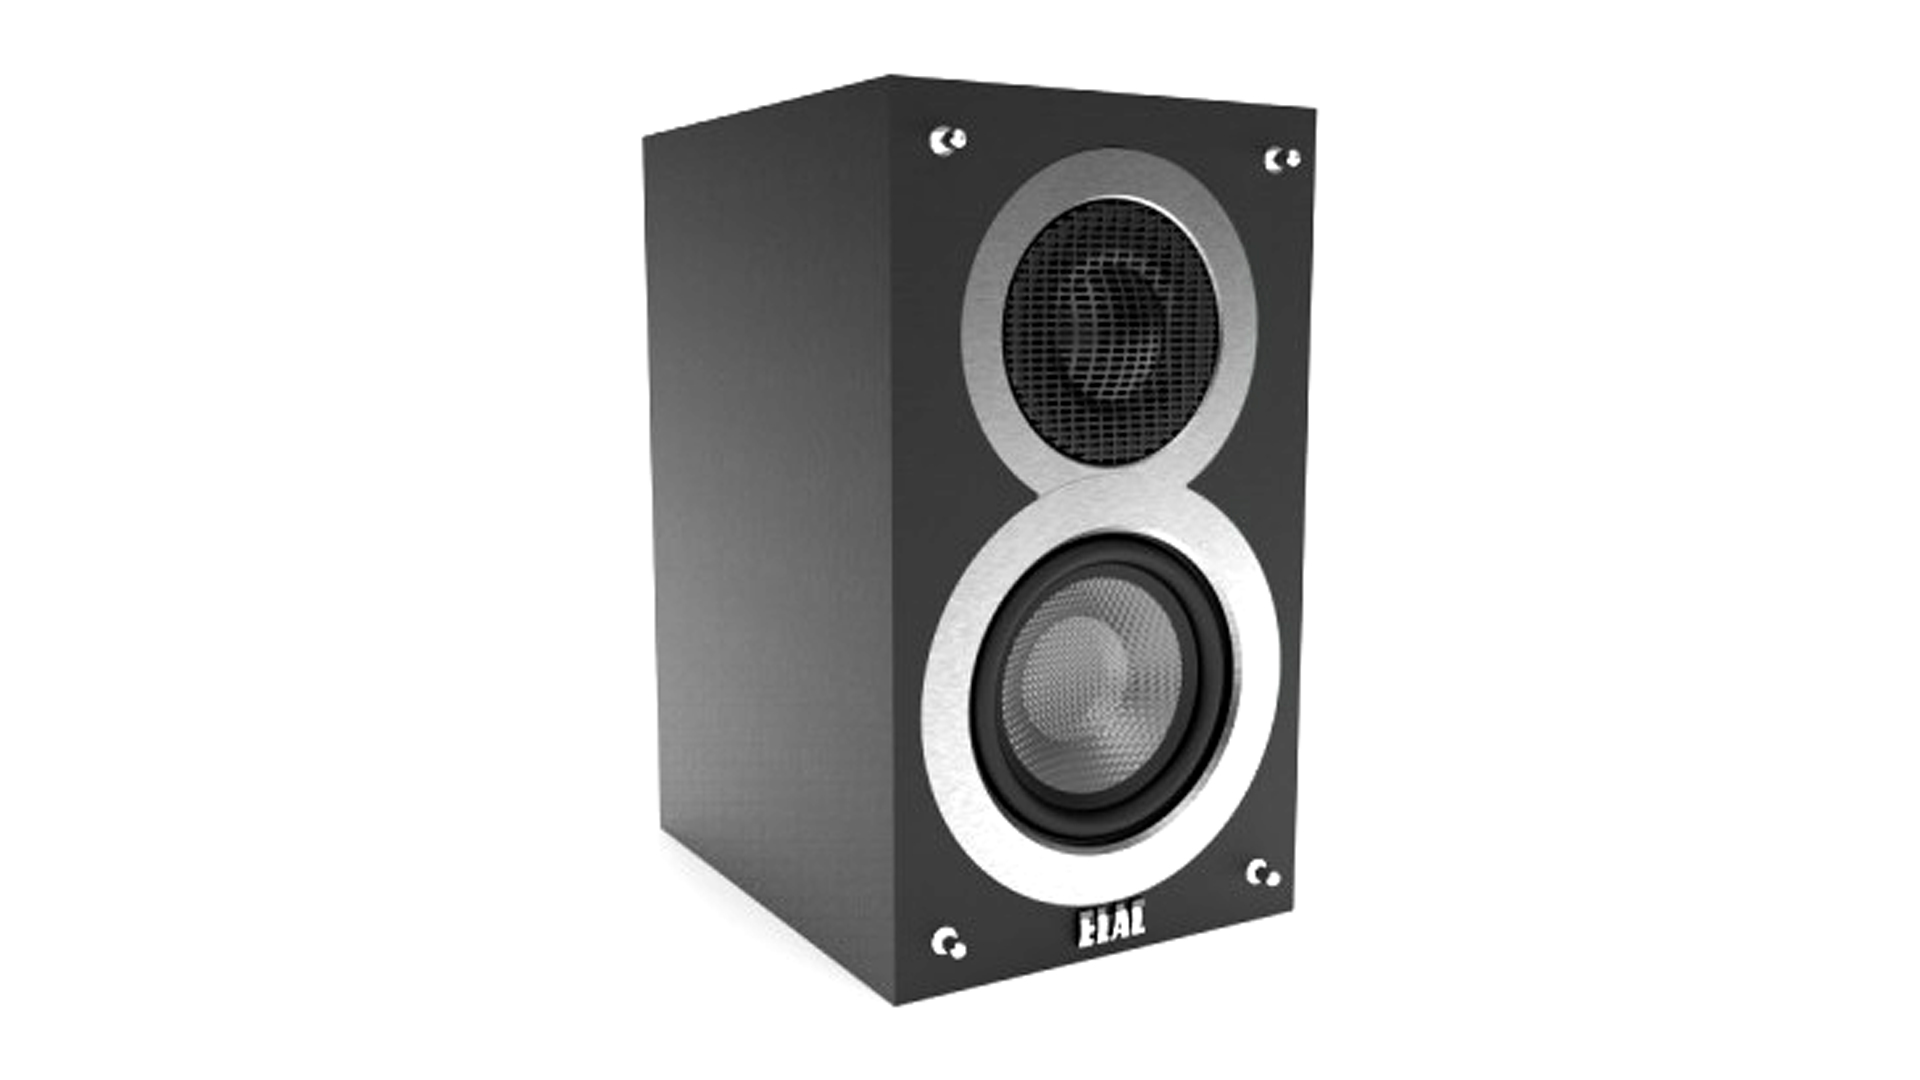 ELAC B4 Bookshelf Speakers Audio/Video Reviews | Popzara Press